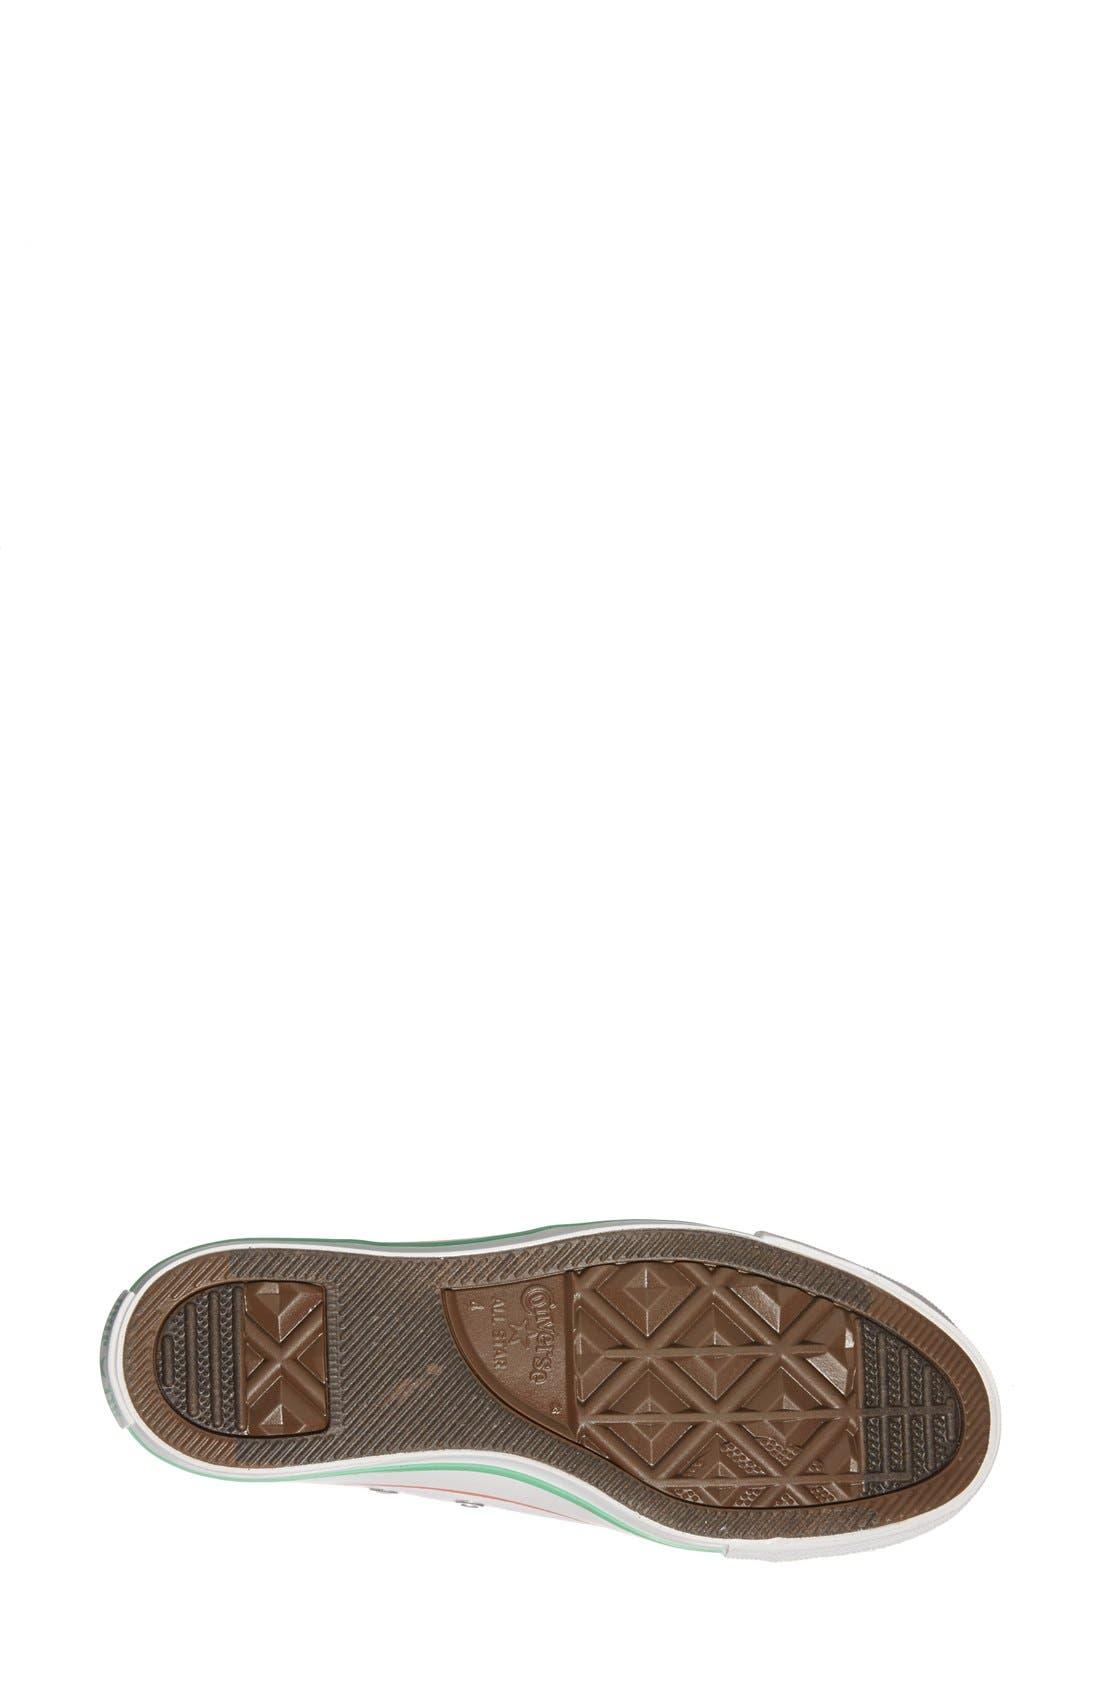 Alternate Image 4  - Converse Chuck Taylor® All Star® Laceless Slip-On Sneaker (Women)